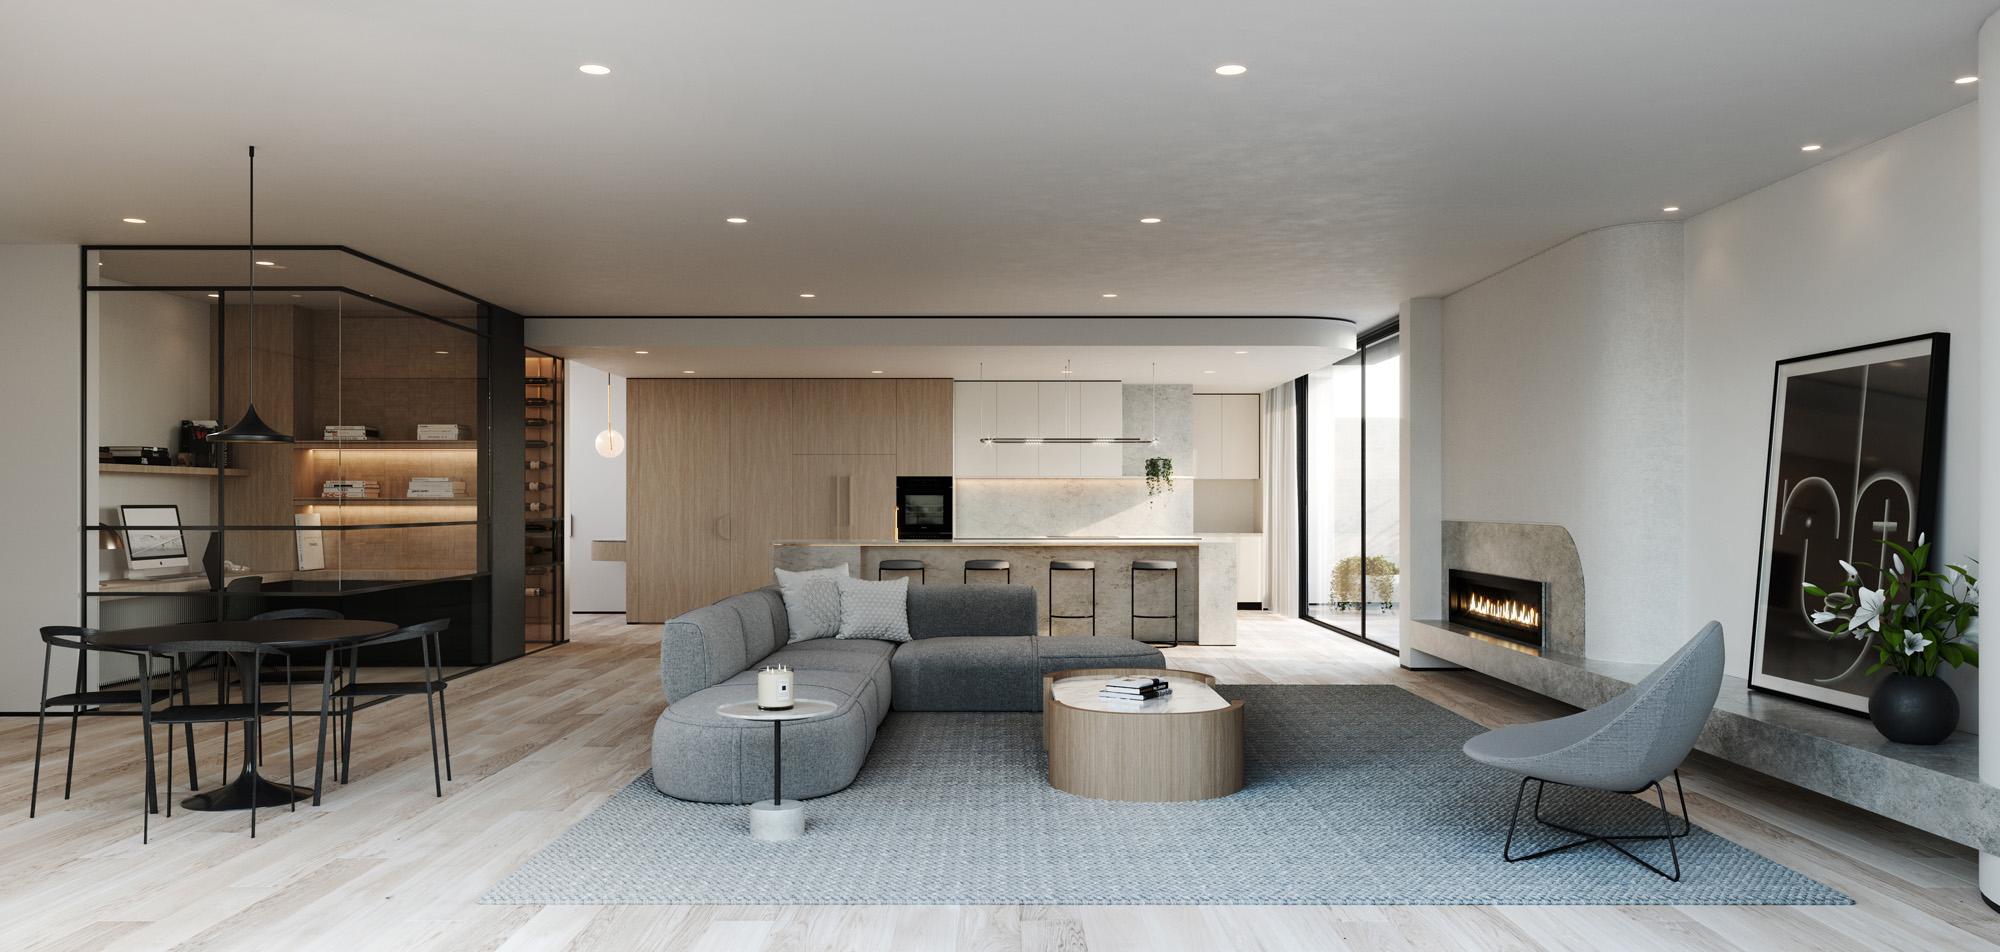 L'oro-Mckimm-3D-image-visualisation-loungeroom